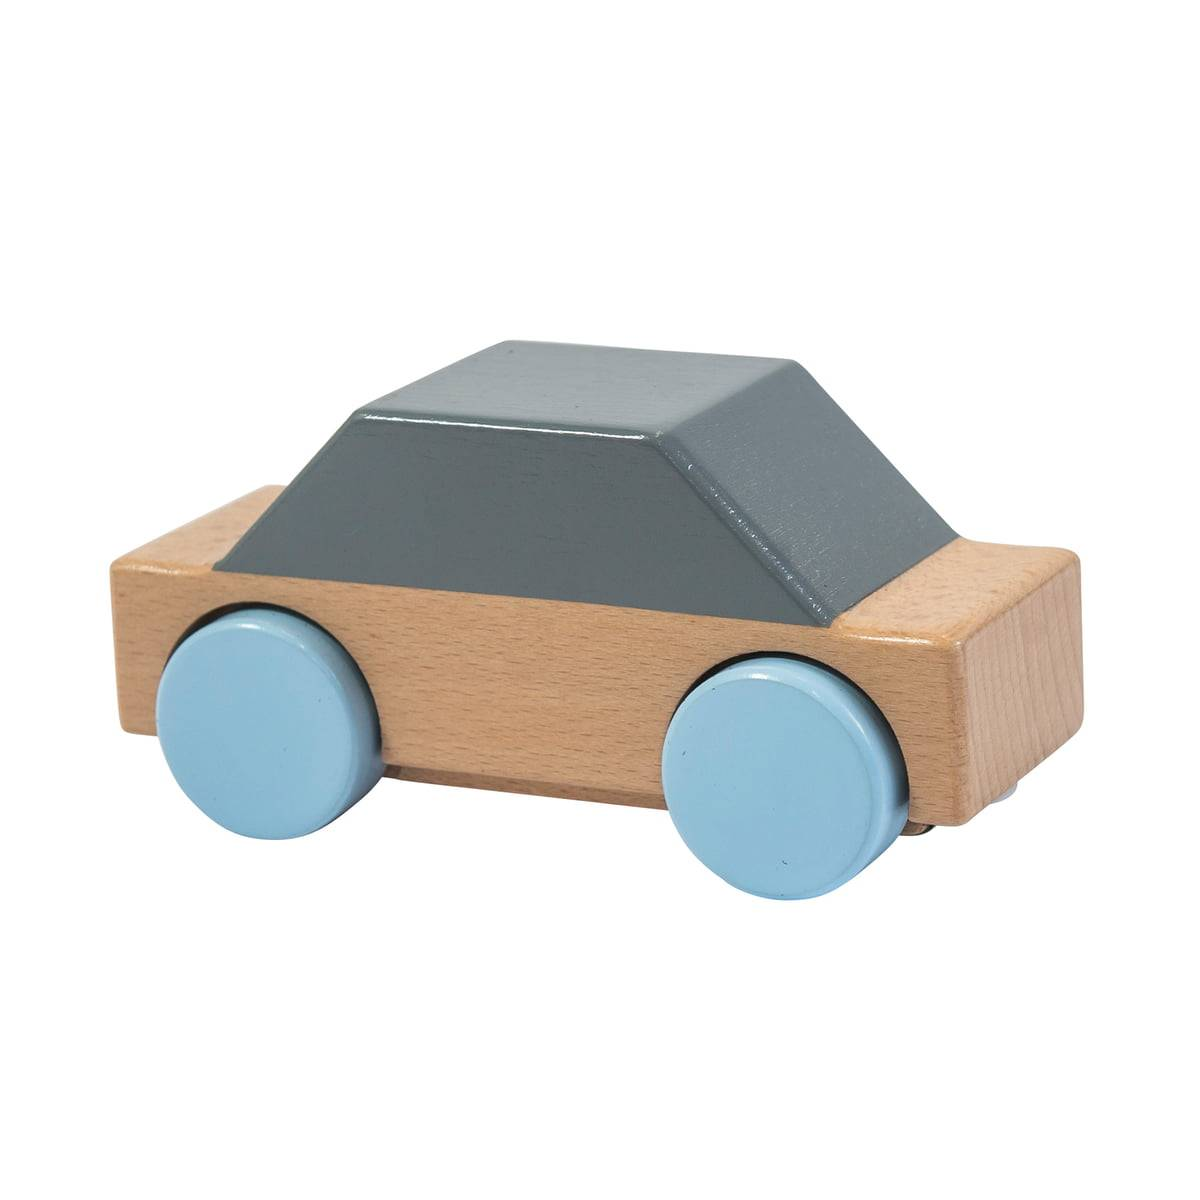 Sebra - Spielzeugauto aus Holz, grau